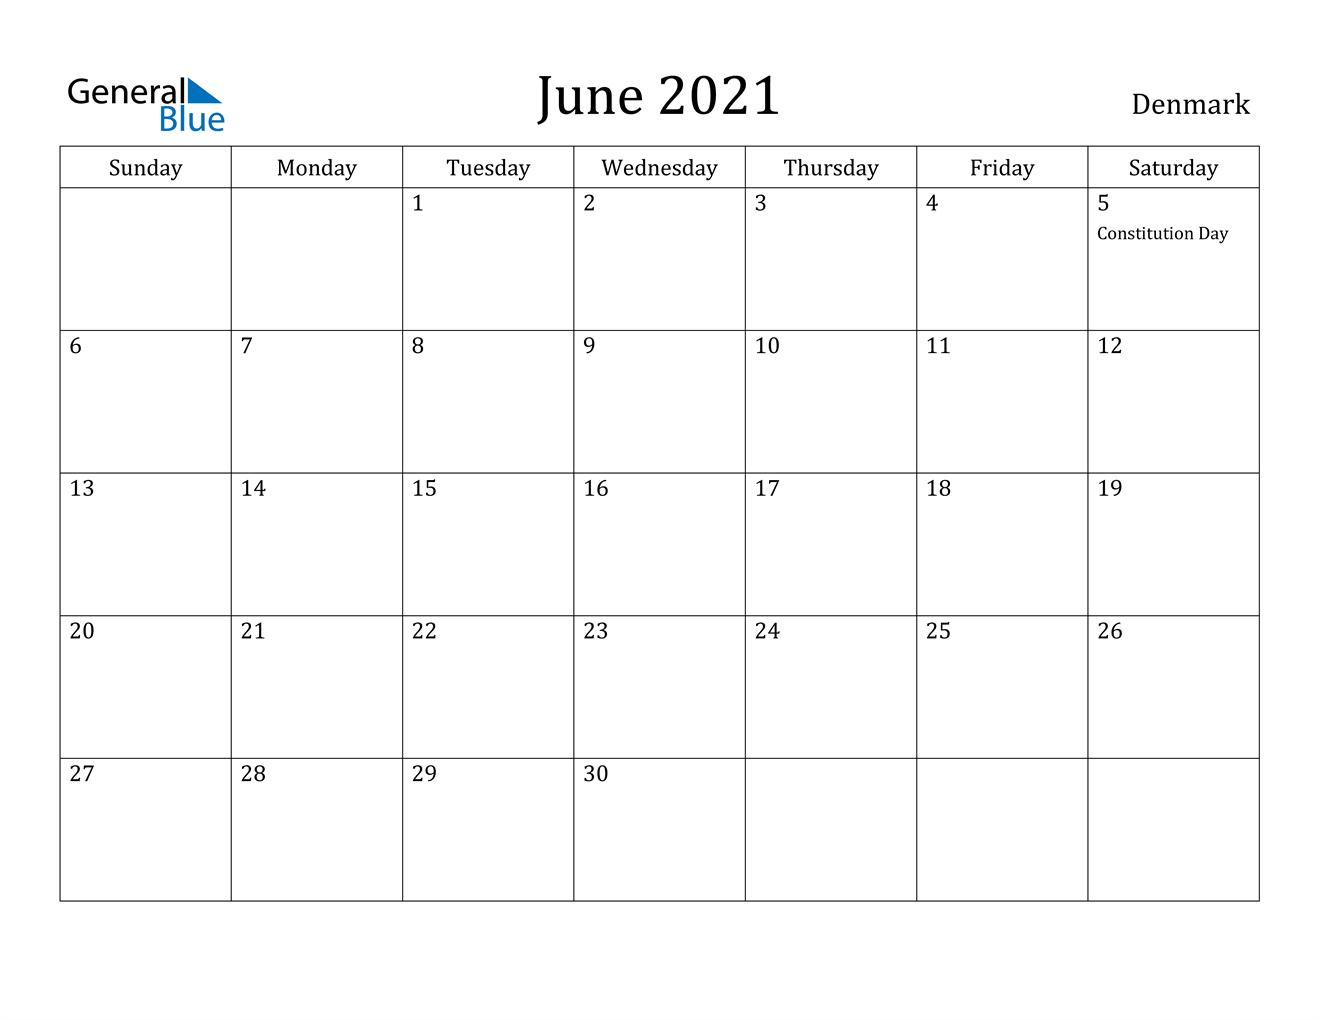 June 2021 Calendar - Denmark